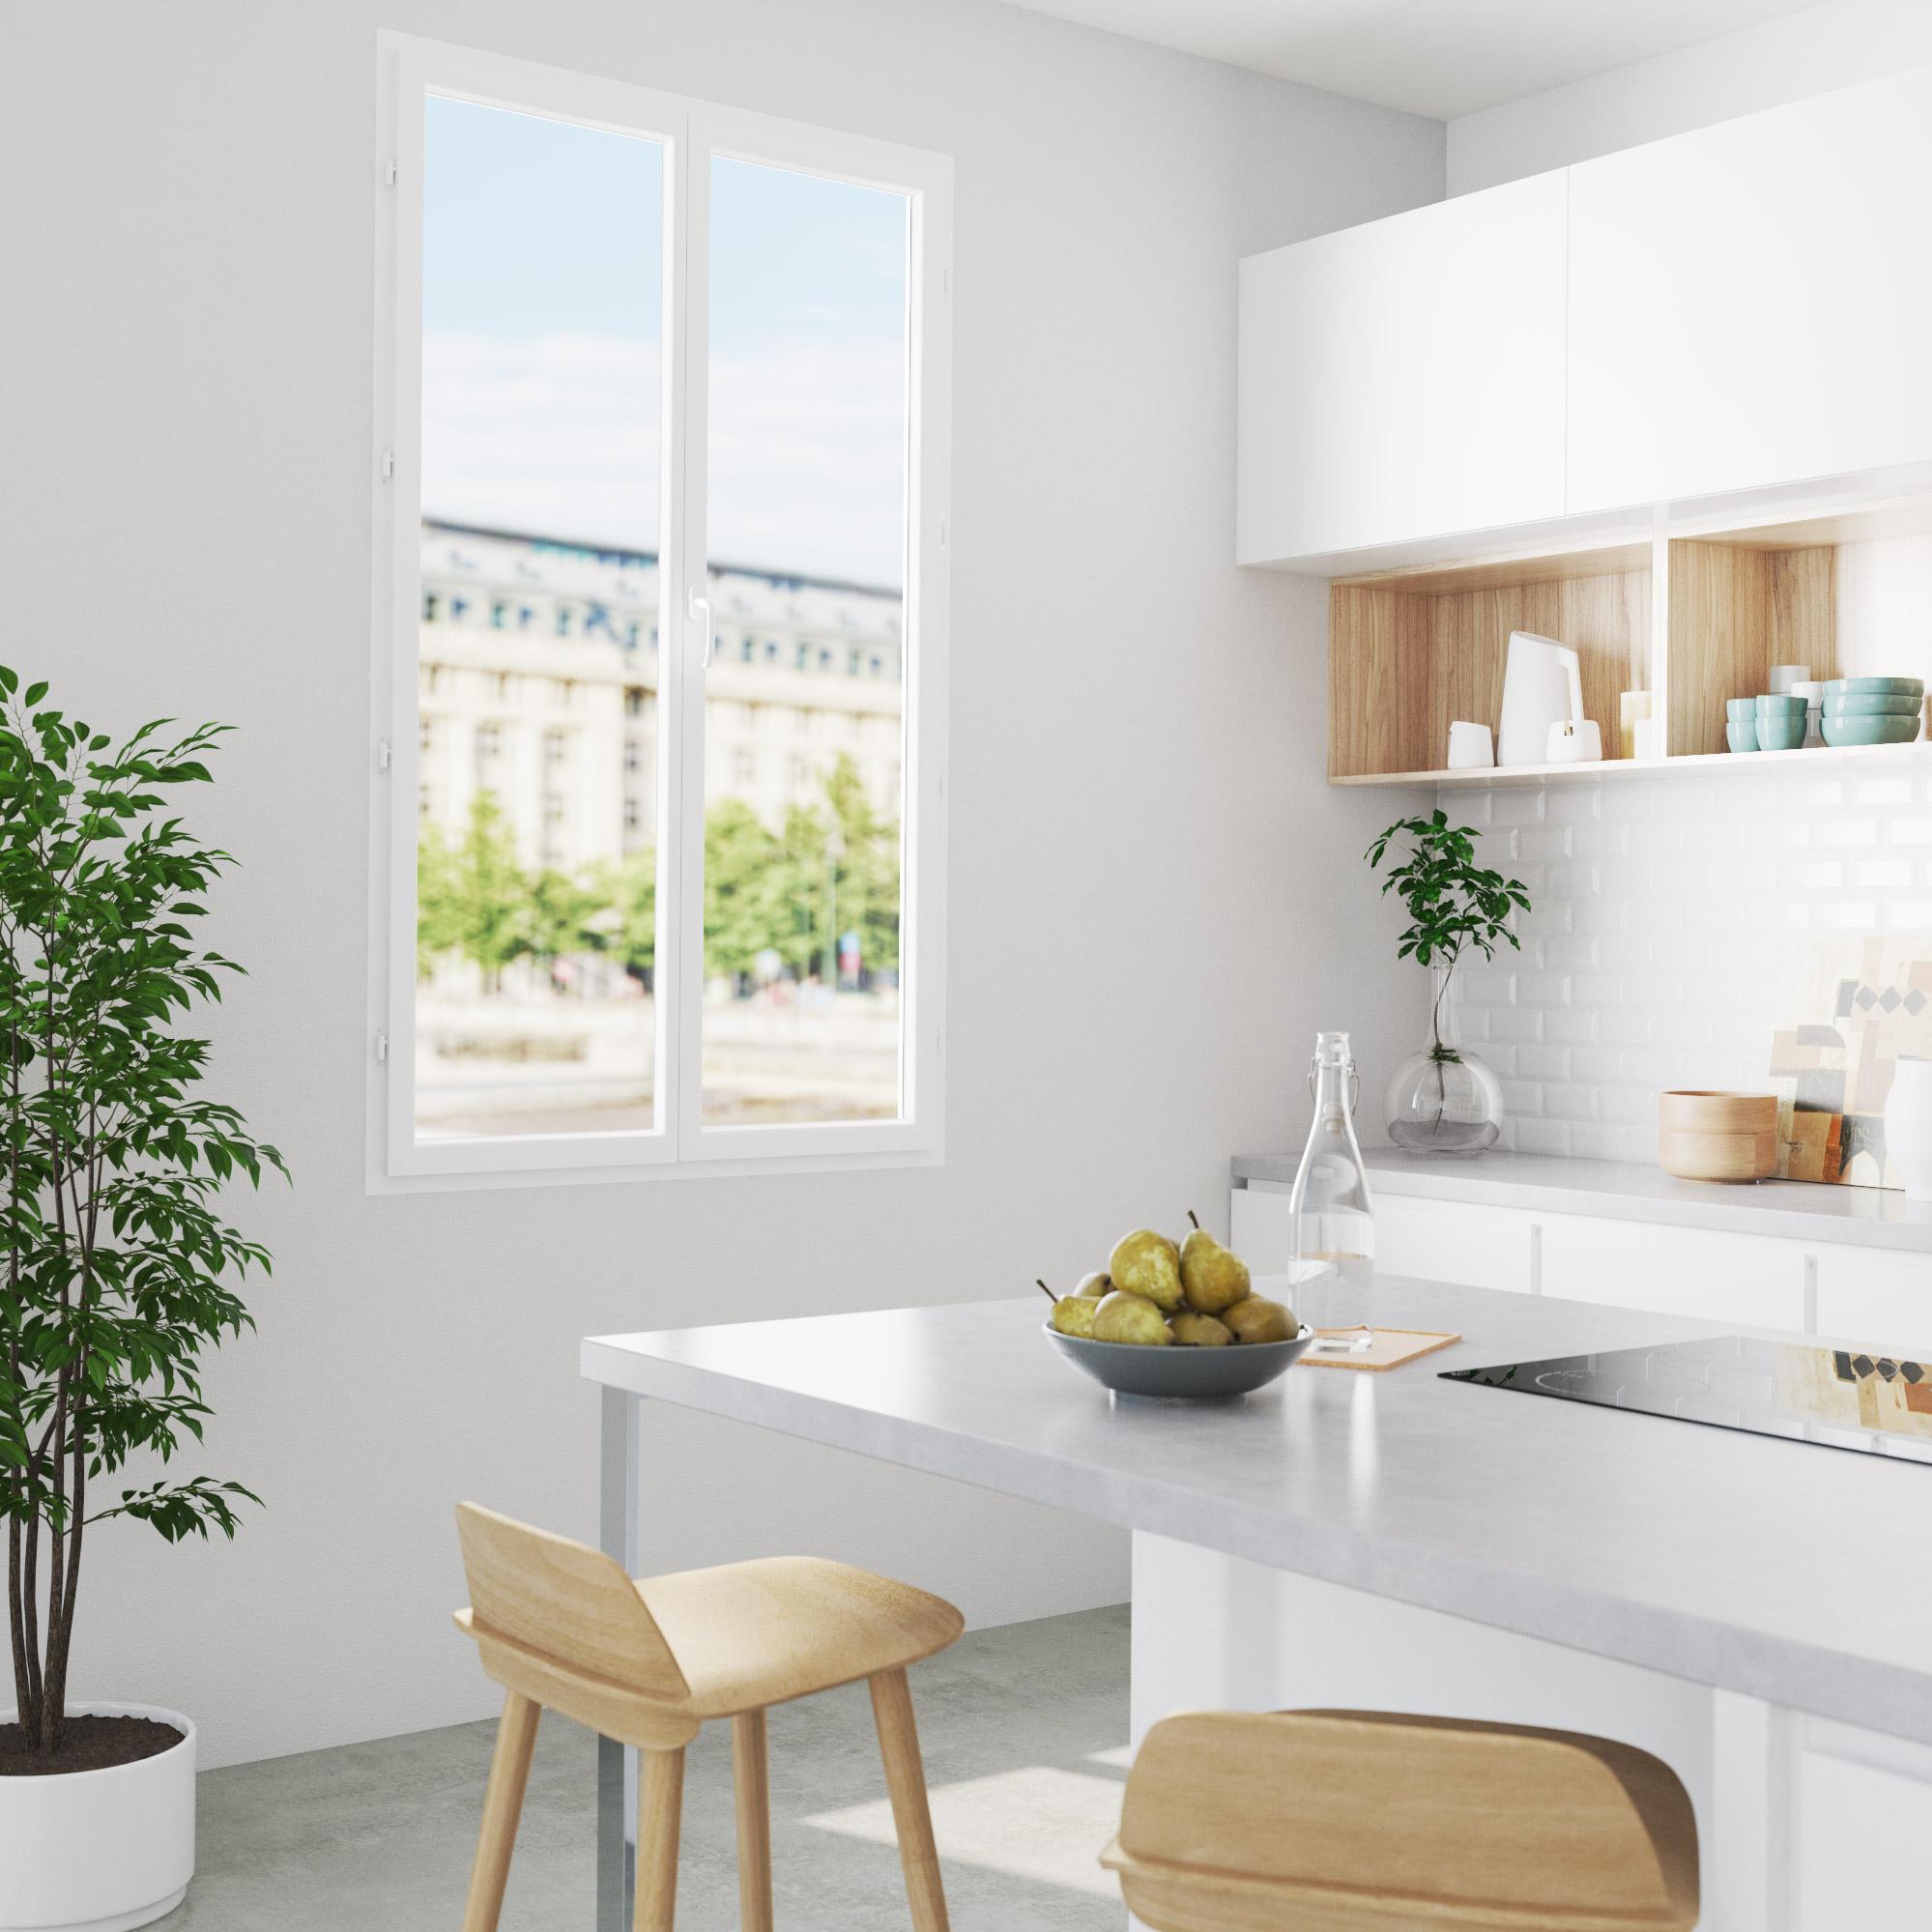 Fenêtre PVC H.195 x l.120 cm, blanc / blanc, 2 tirant droit | Leroy Merlin